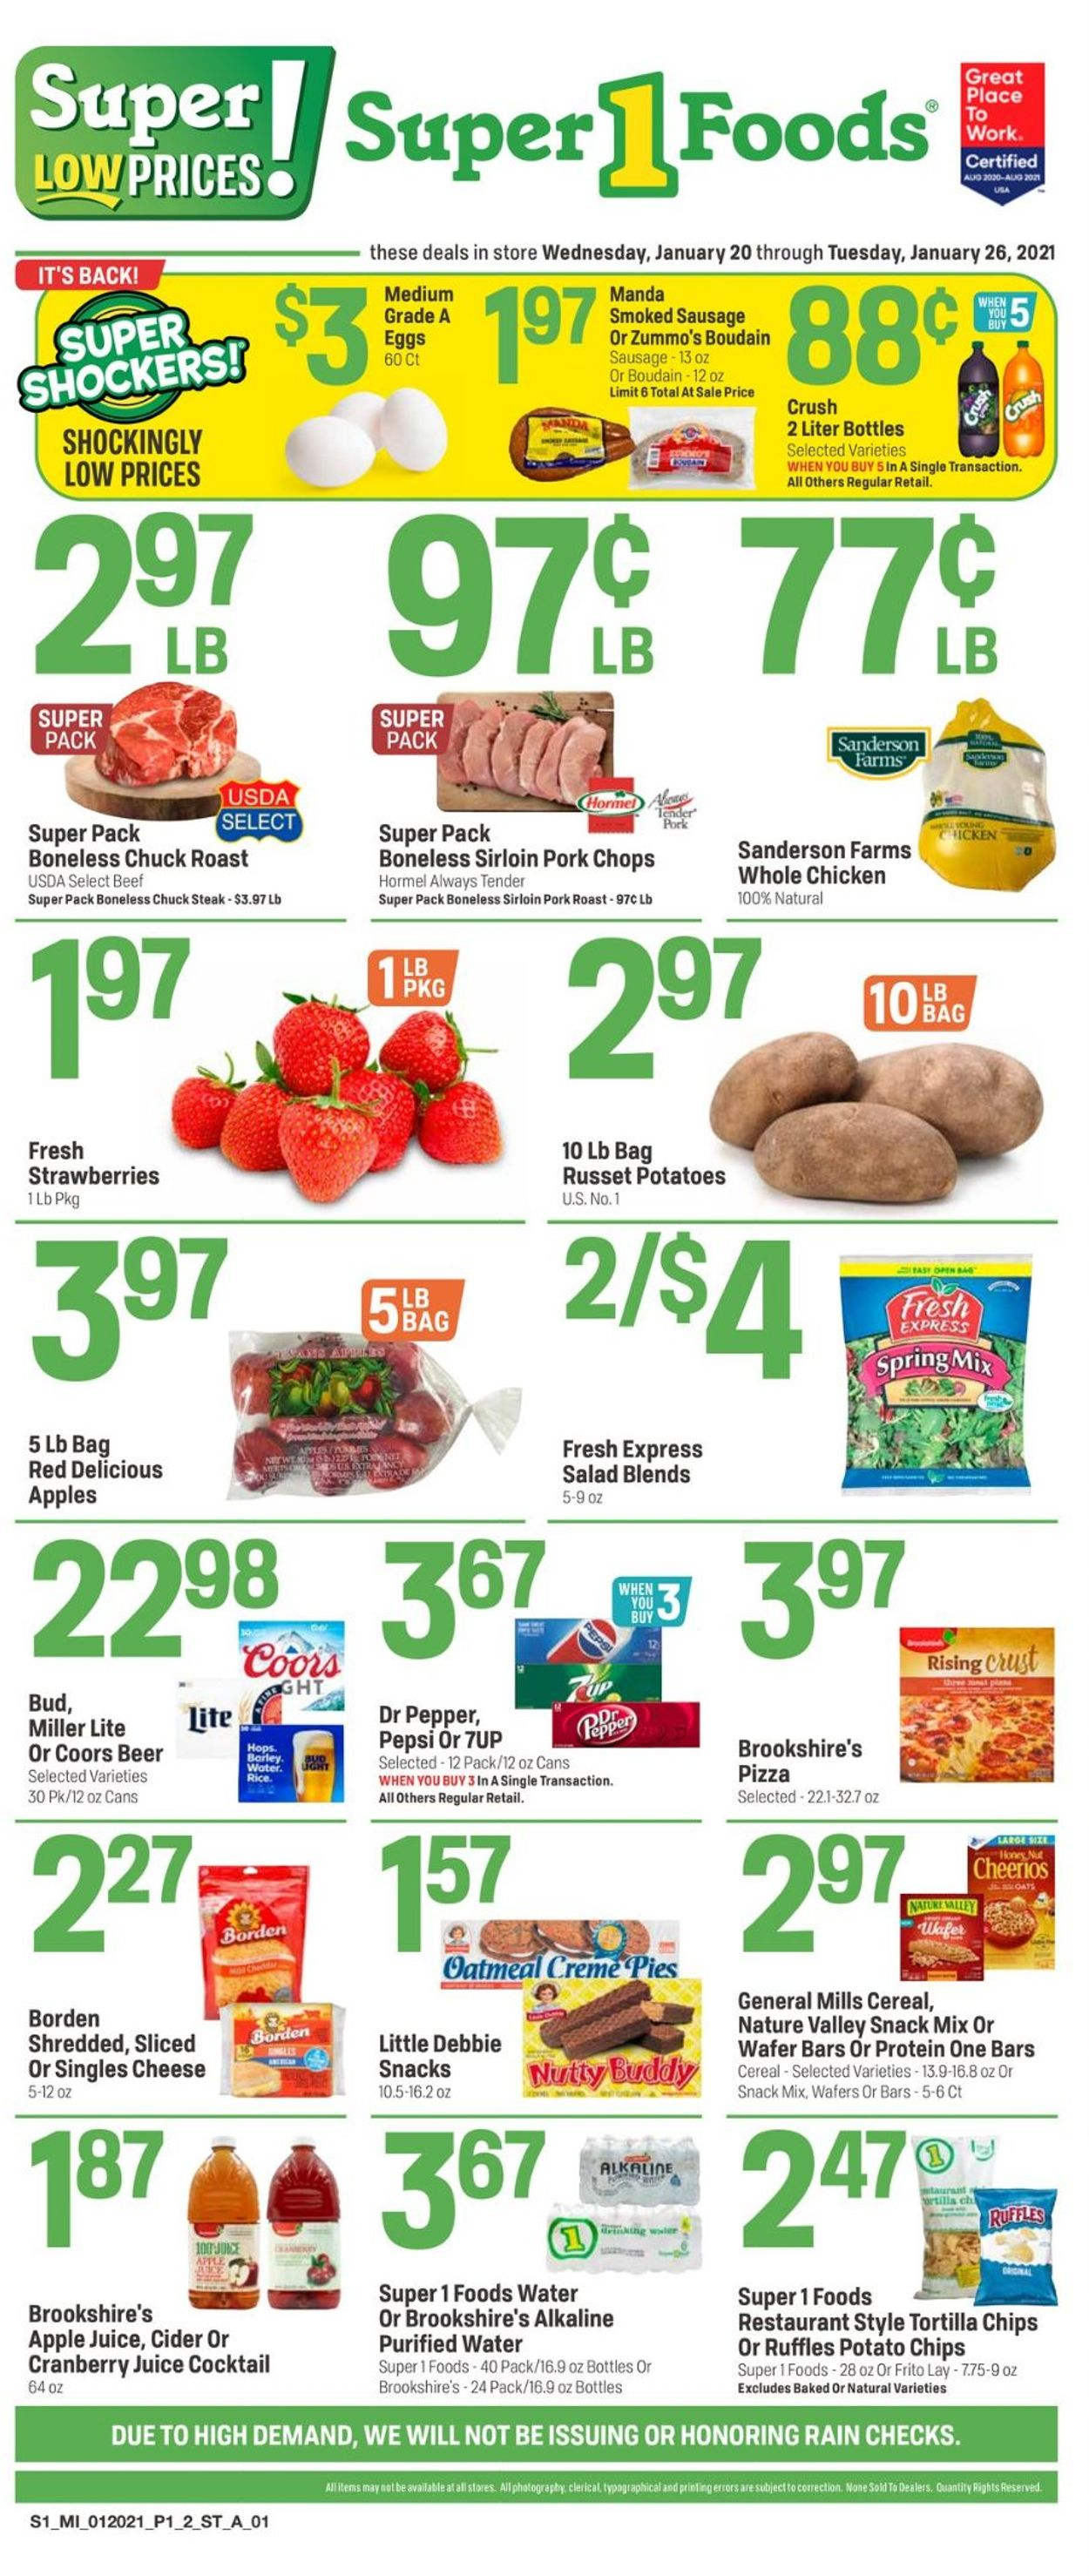 Super 1 Foods Weekly Ad Circular - valid 01/20-01/26/2021